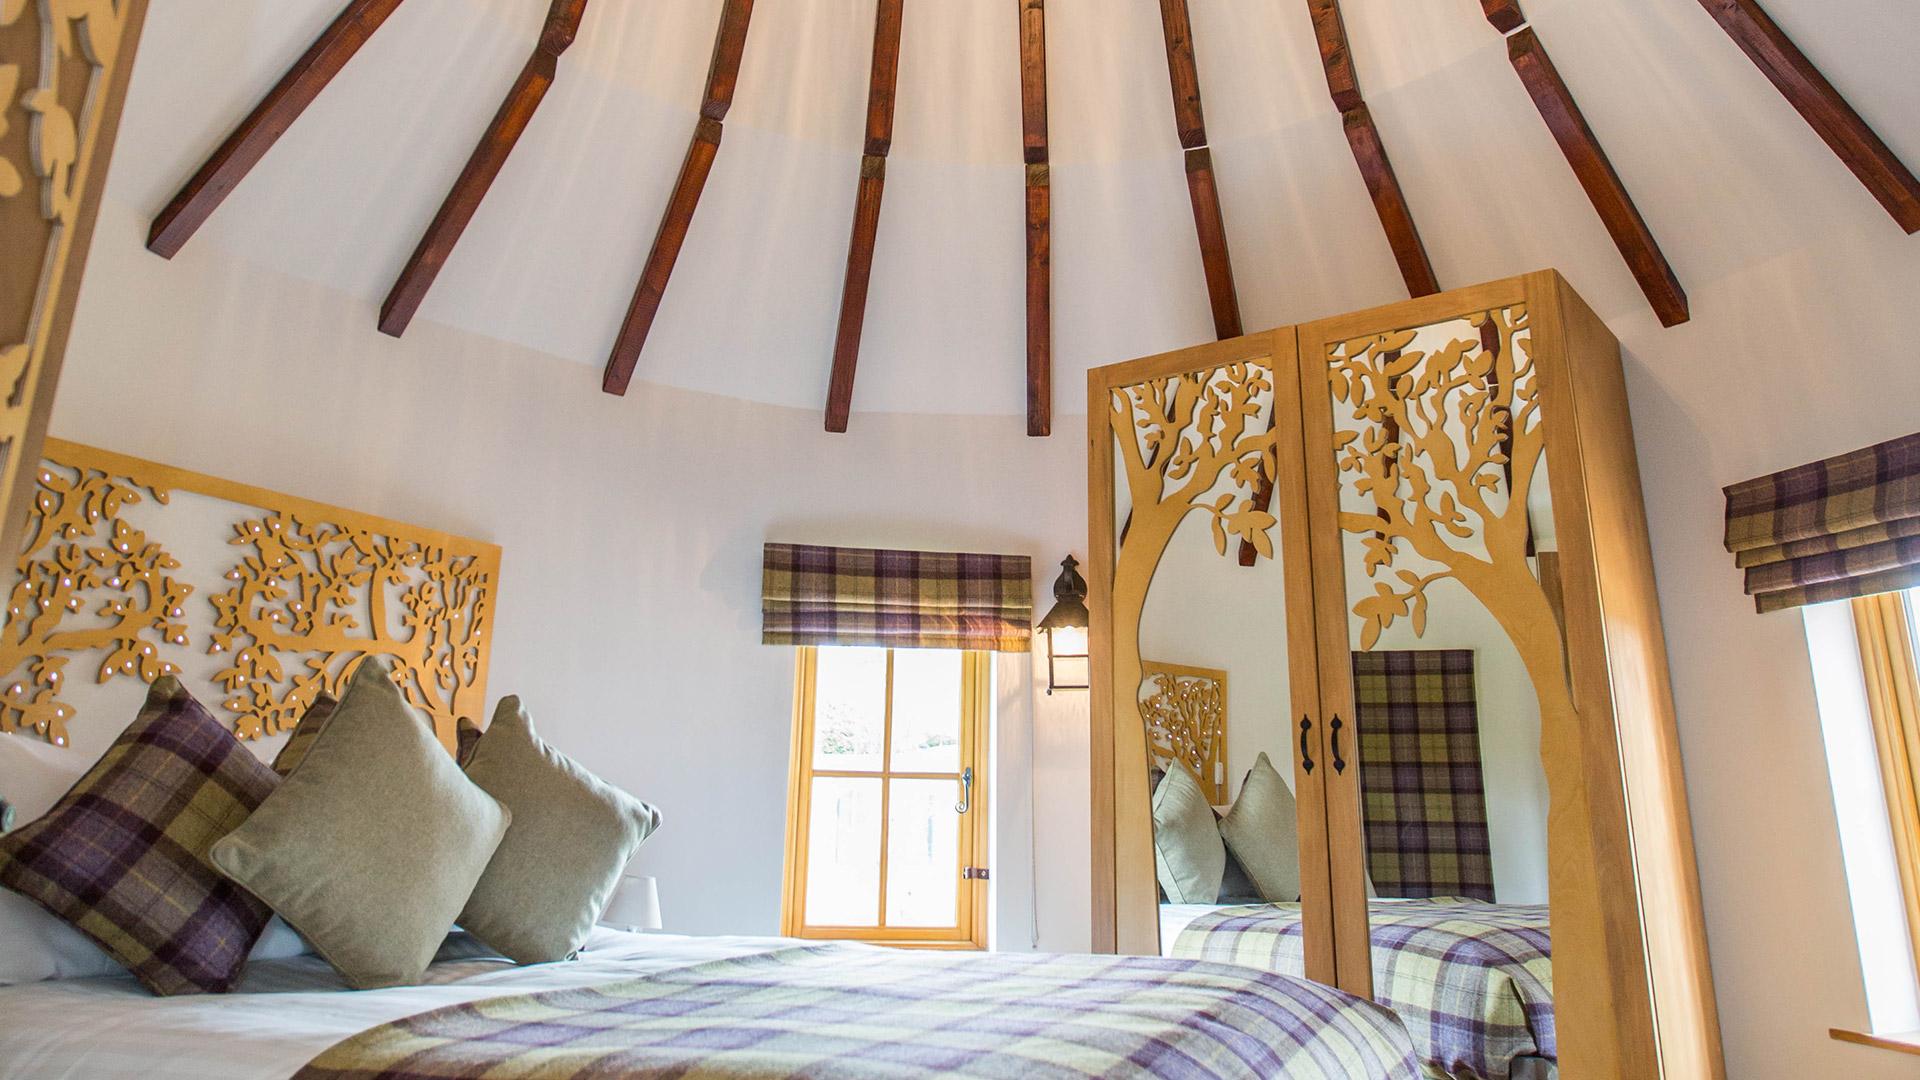 enchanted village treehouse holidays  alton towers resort